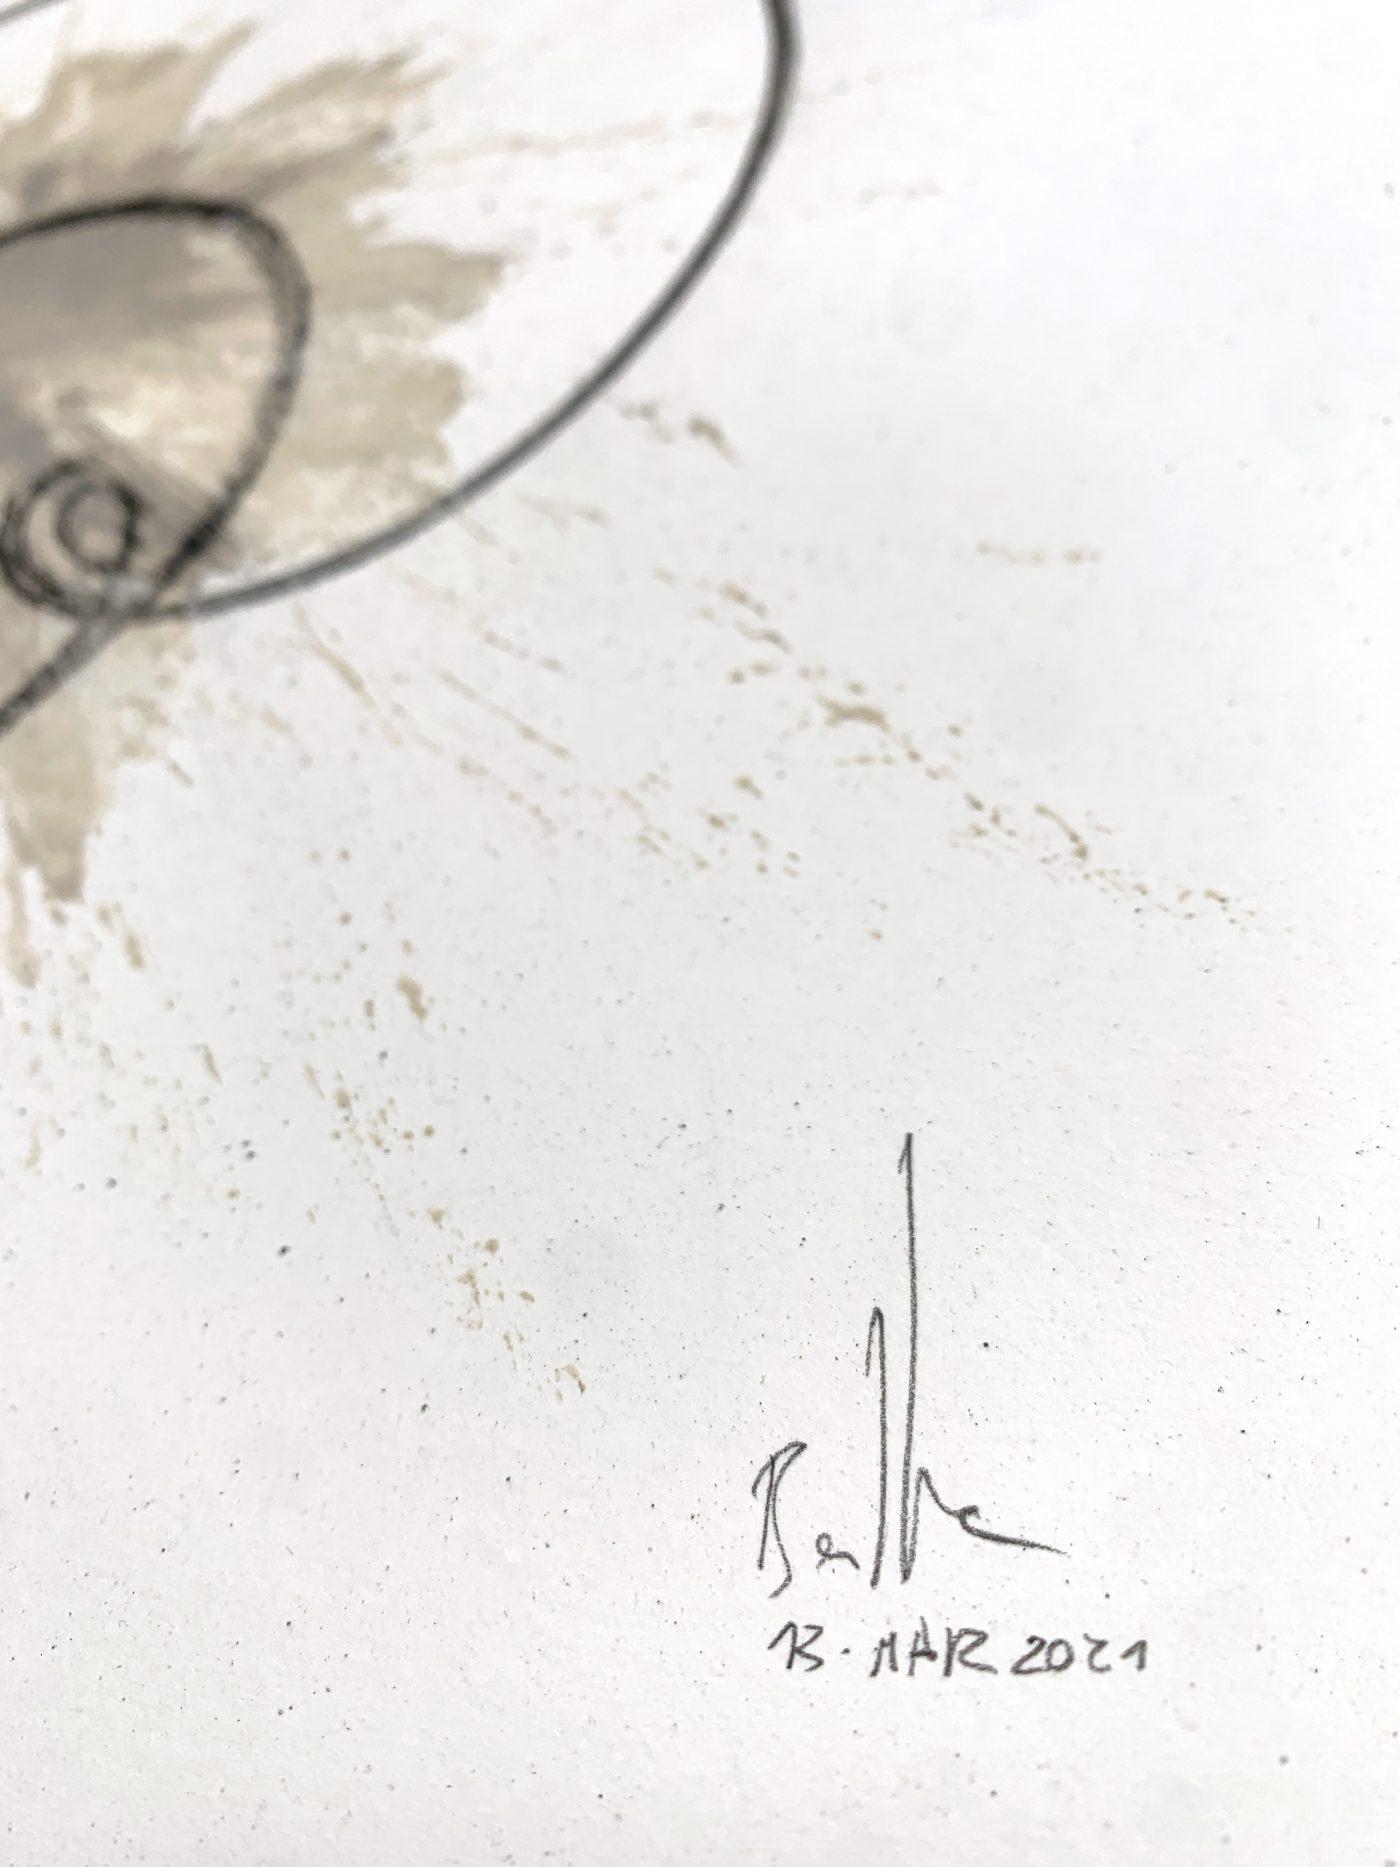 x438 - 13 Mar 2021